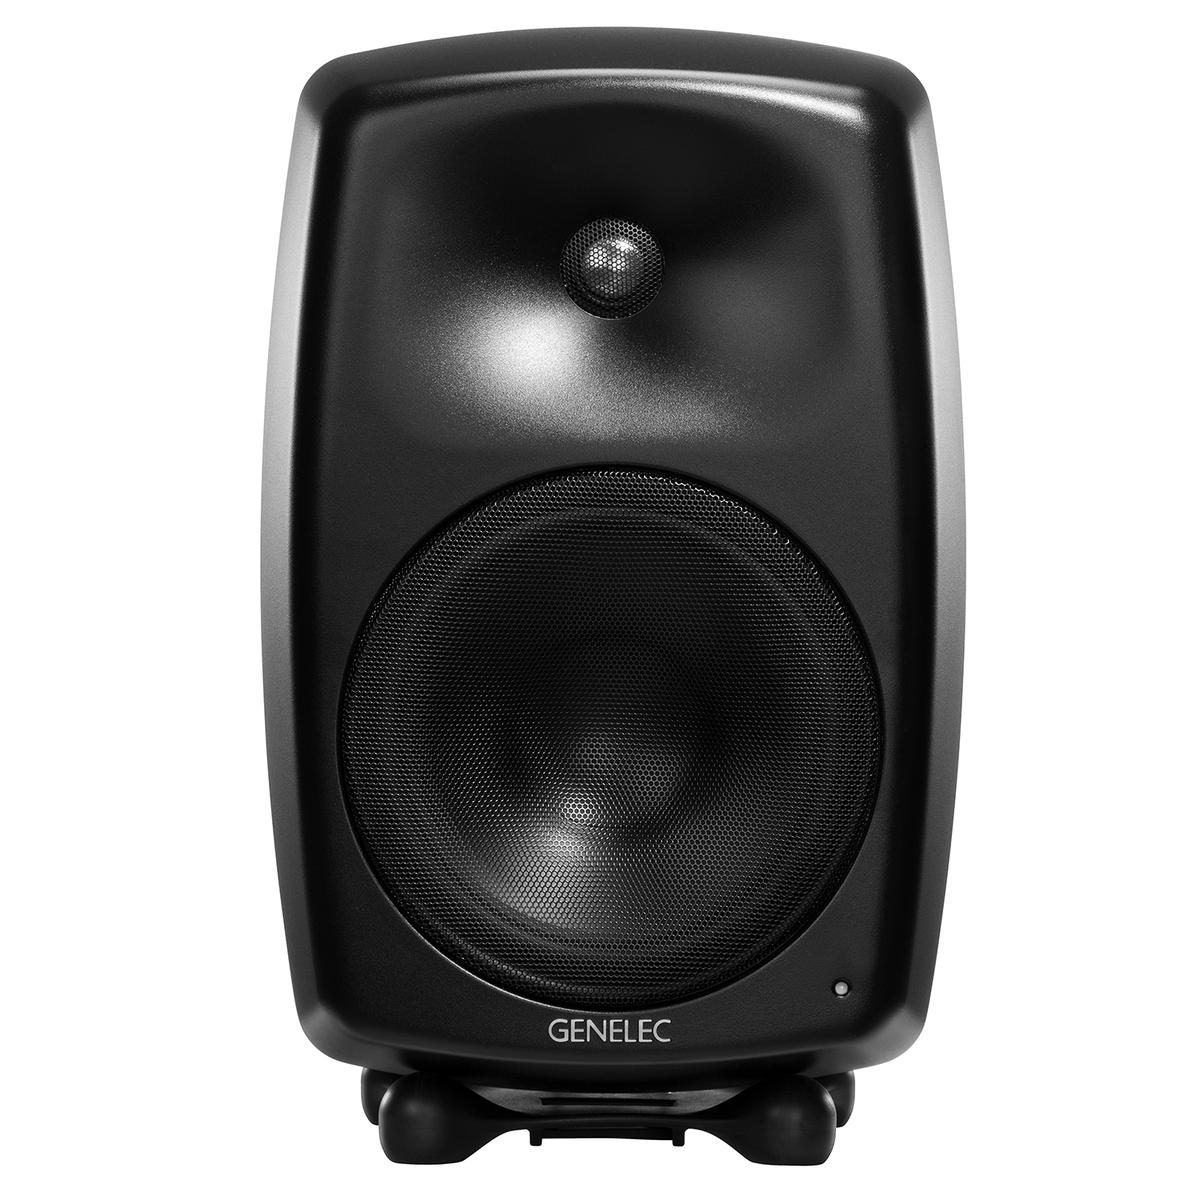 Genelec G Four active speaker, black